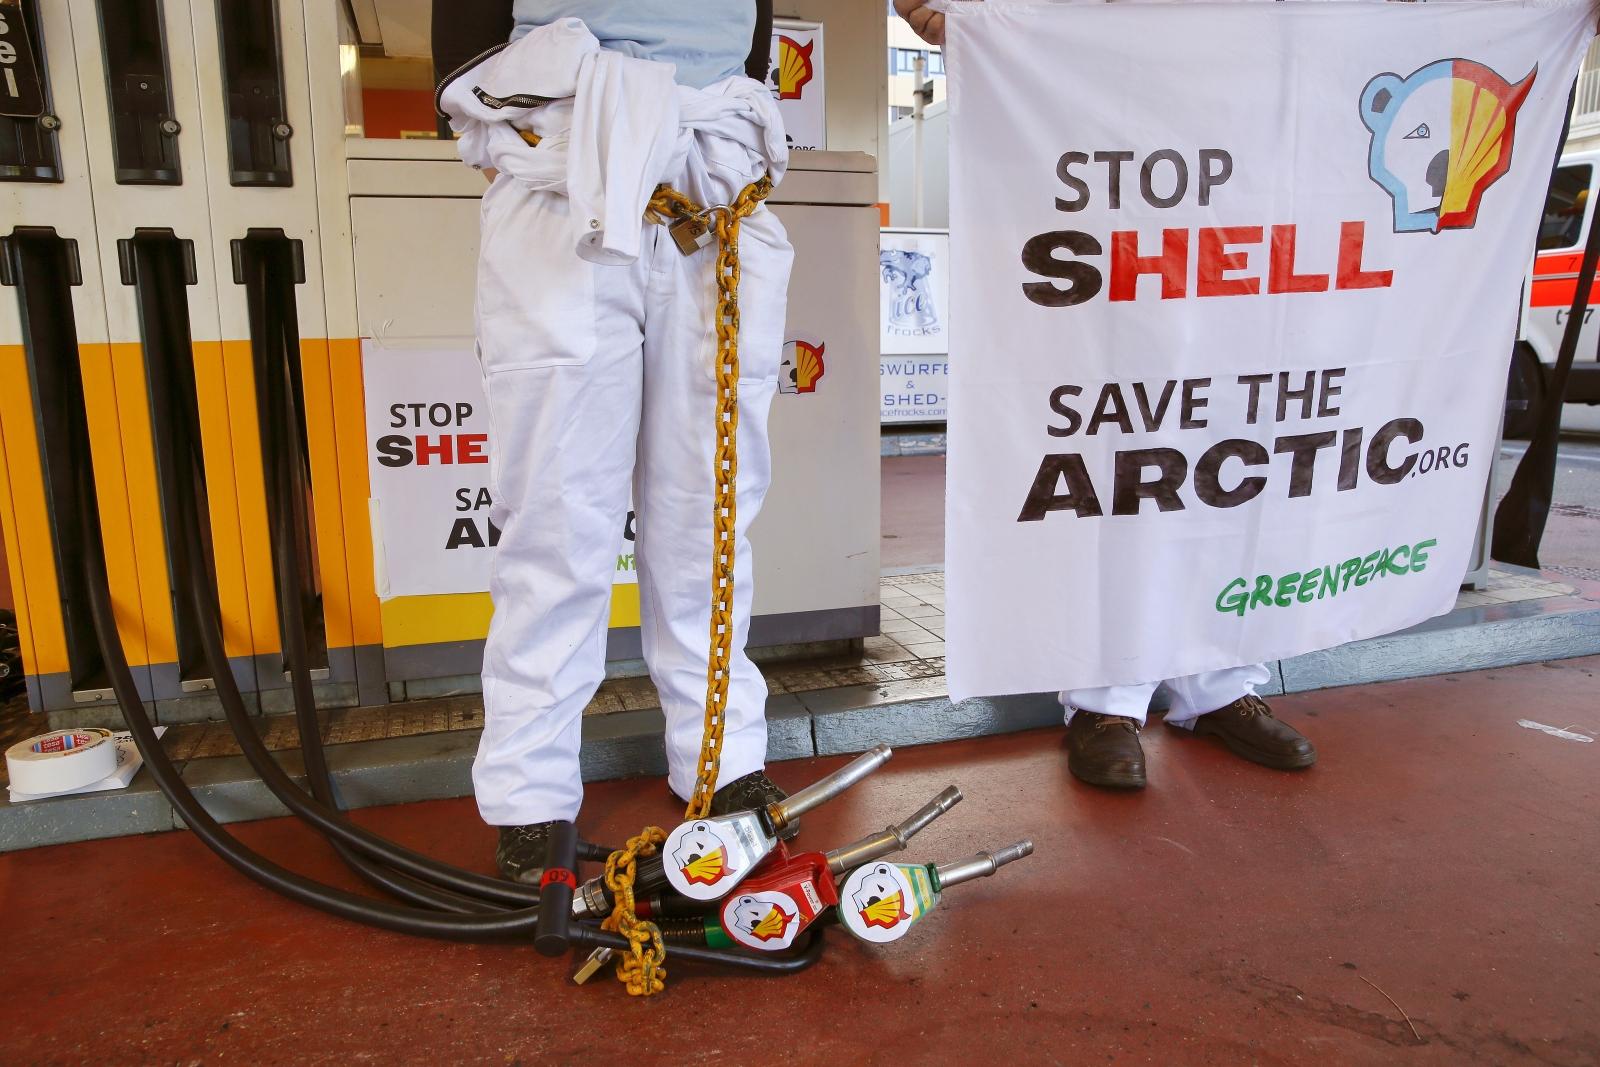 Greenpeace activist